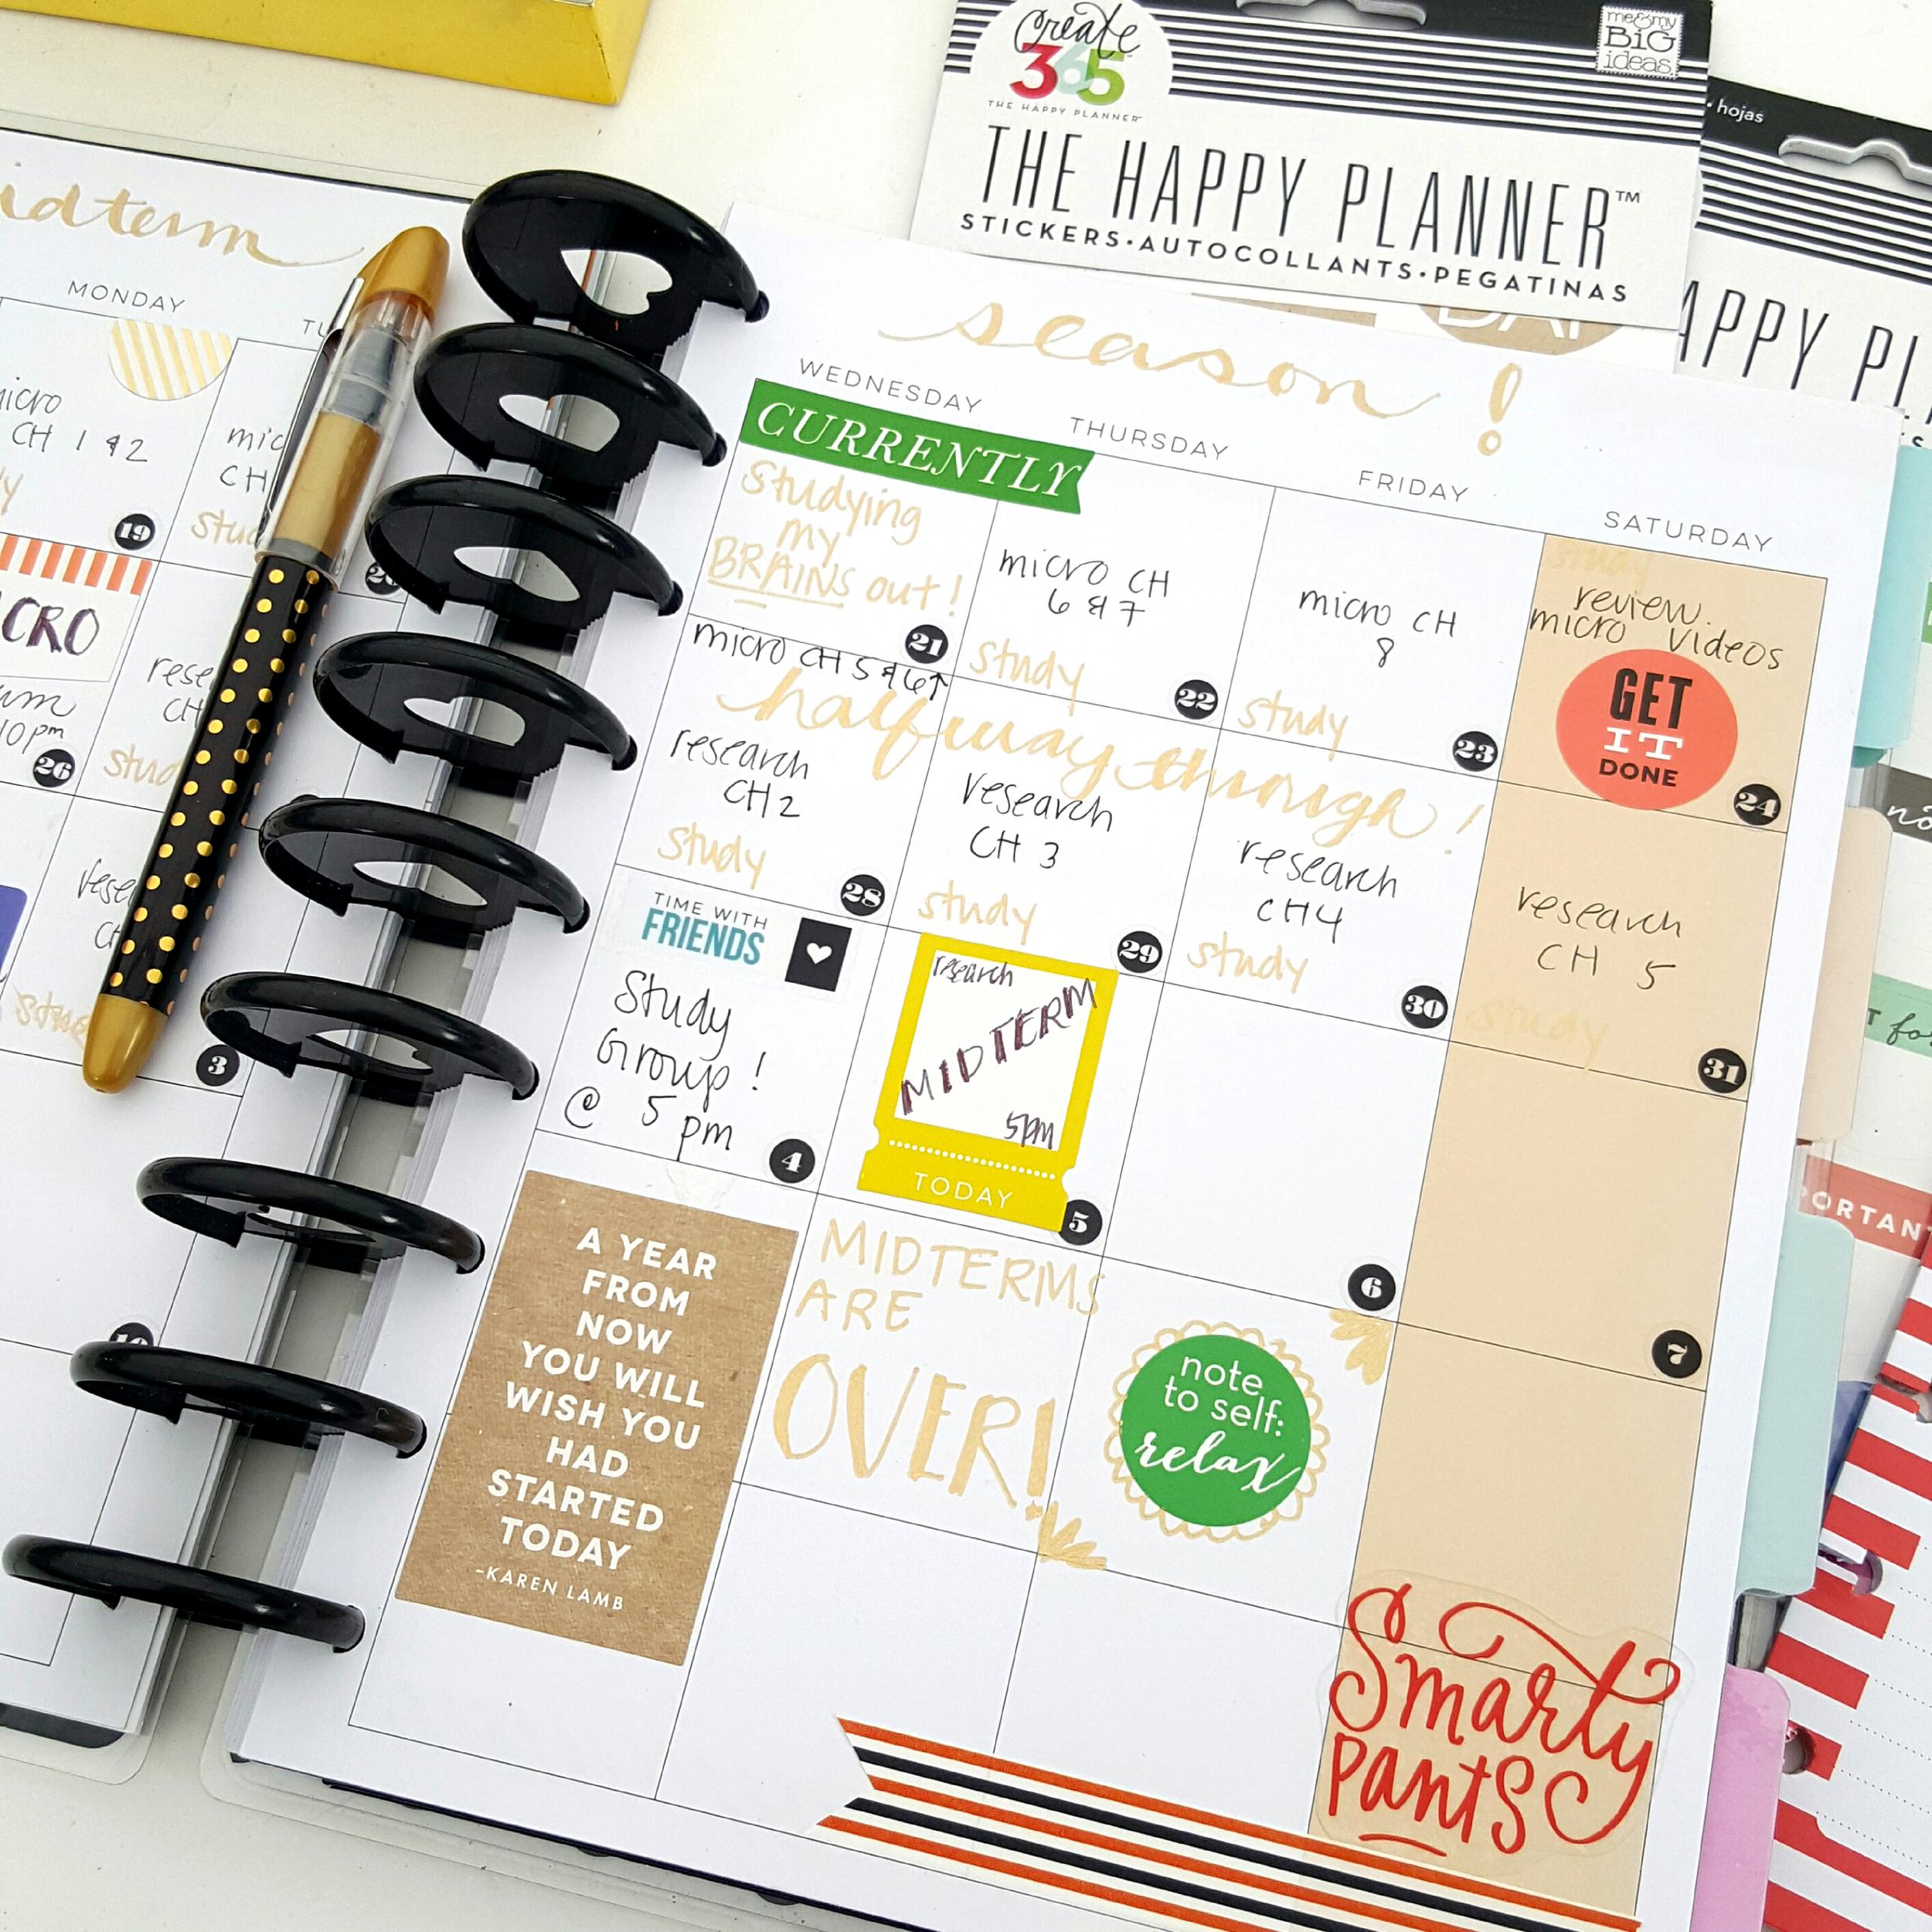 a month of midterm exams in The Happy Planner™ of mambi Design Team member Kiara Vega | me & my BIG ideas